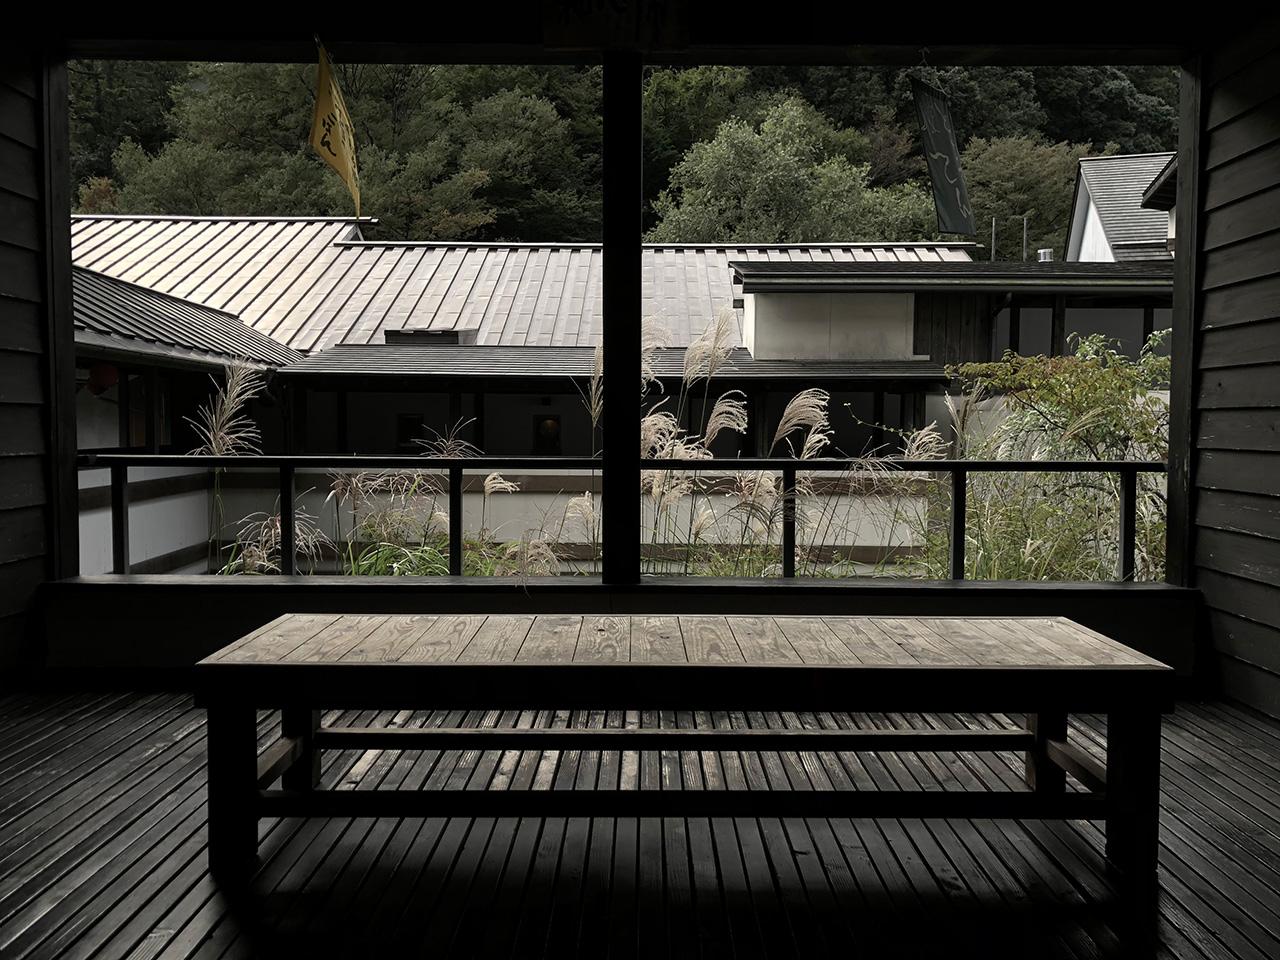 箱根湯本温泉〈天山湯治郷〉の休み処